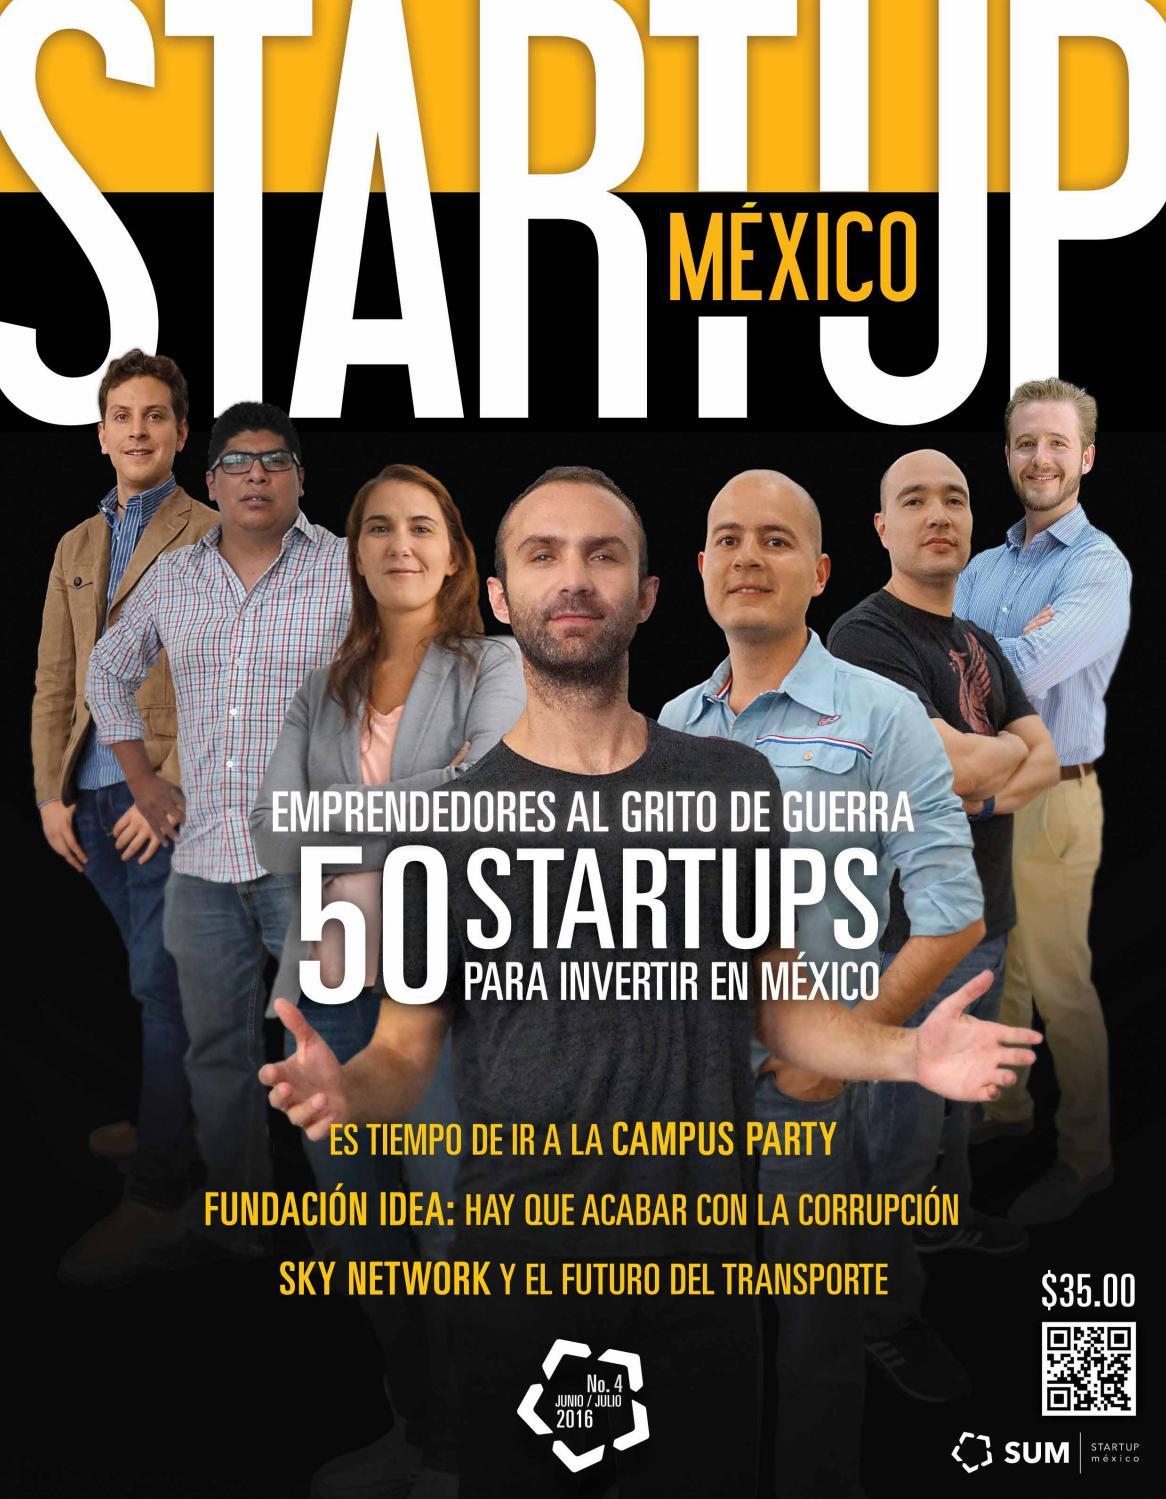 startup m u00e9xico n u00famero 4 by startup m u00e9xico